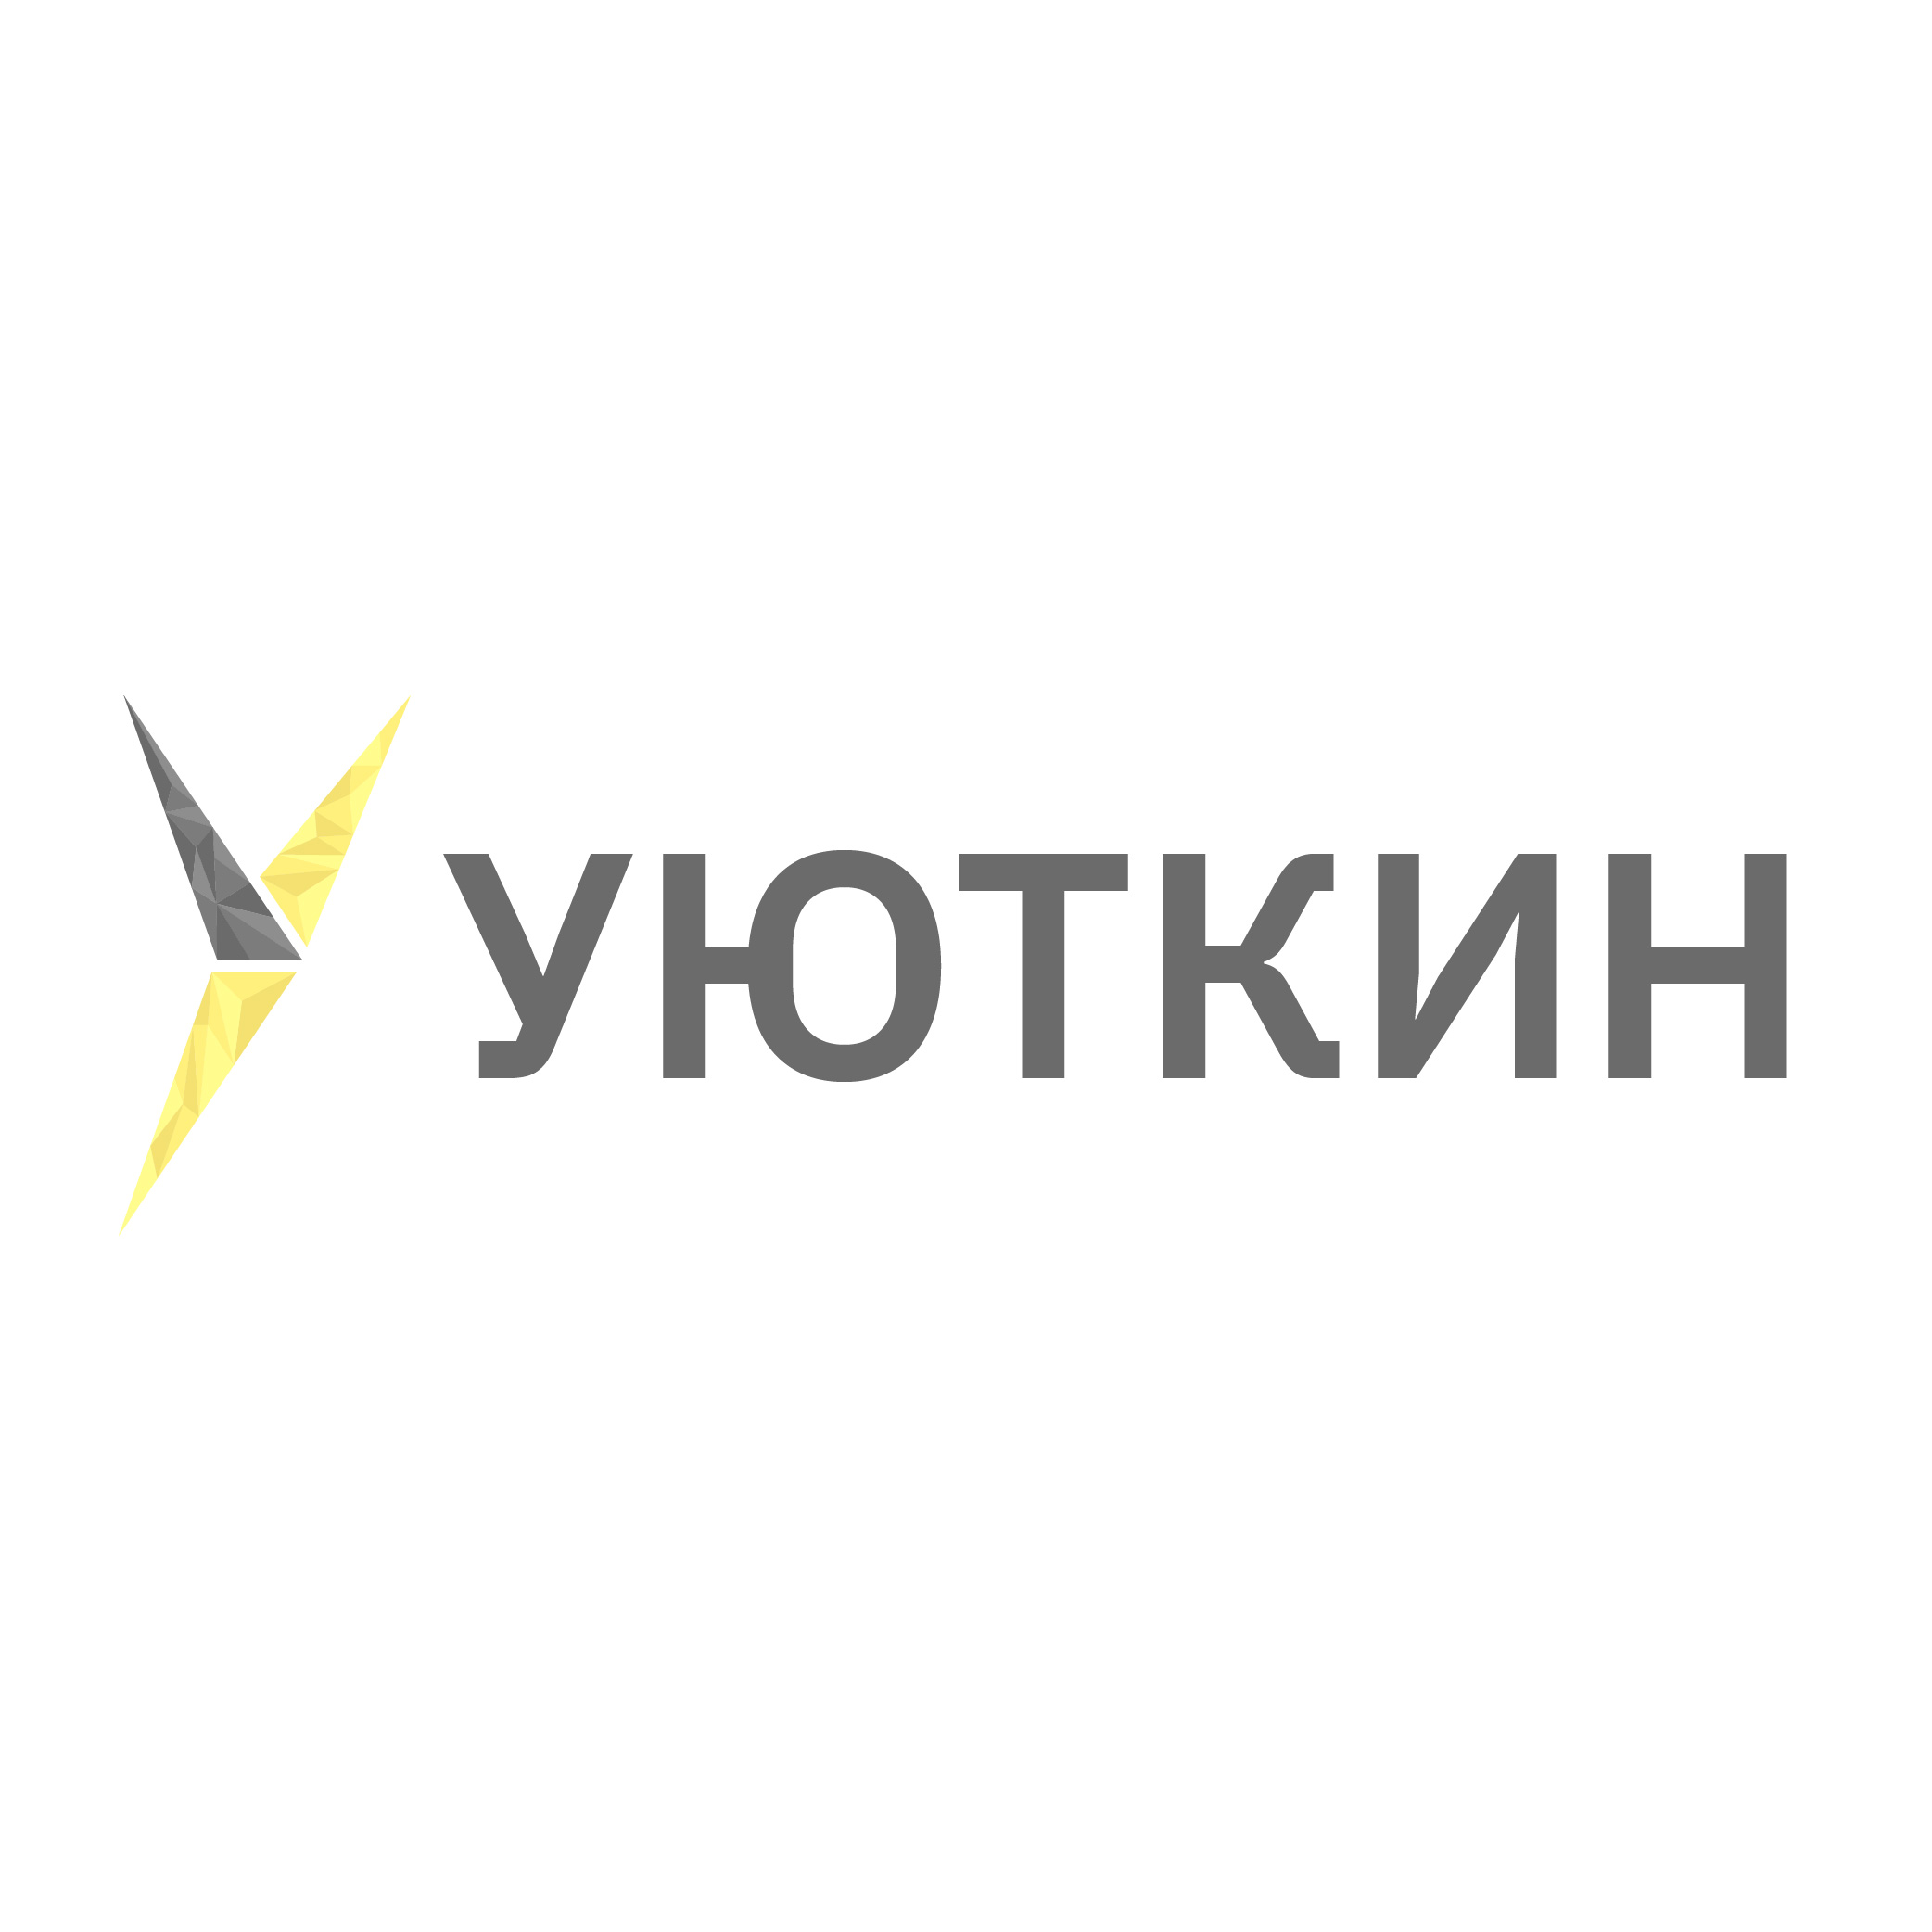 Создание логотипа и стиля сайта фото f_7245c62fb6560583.jpg